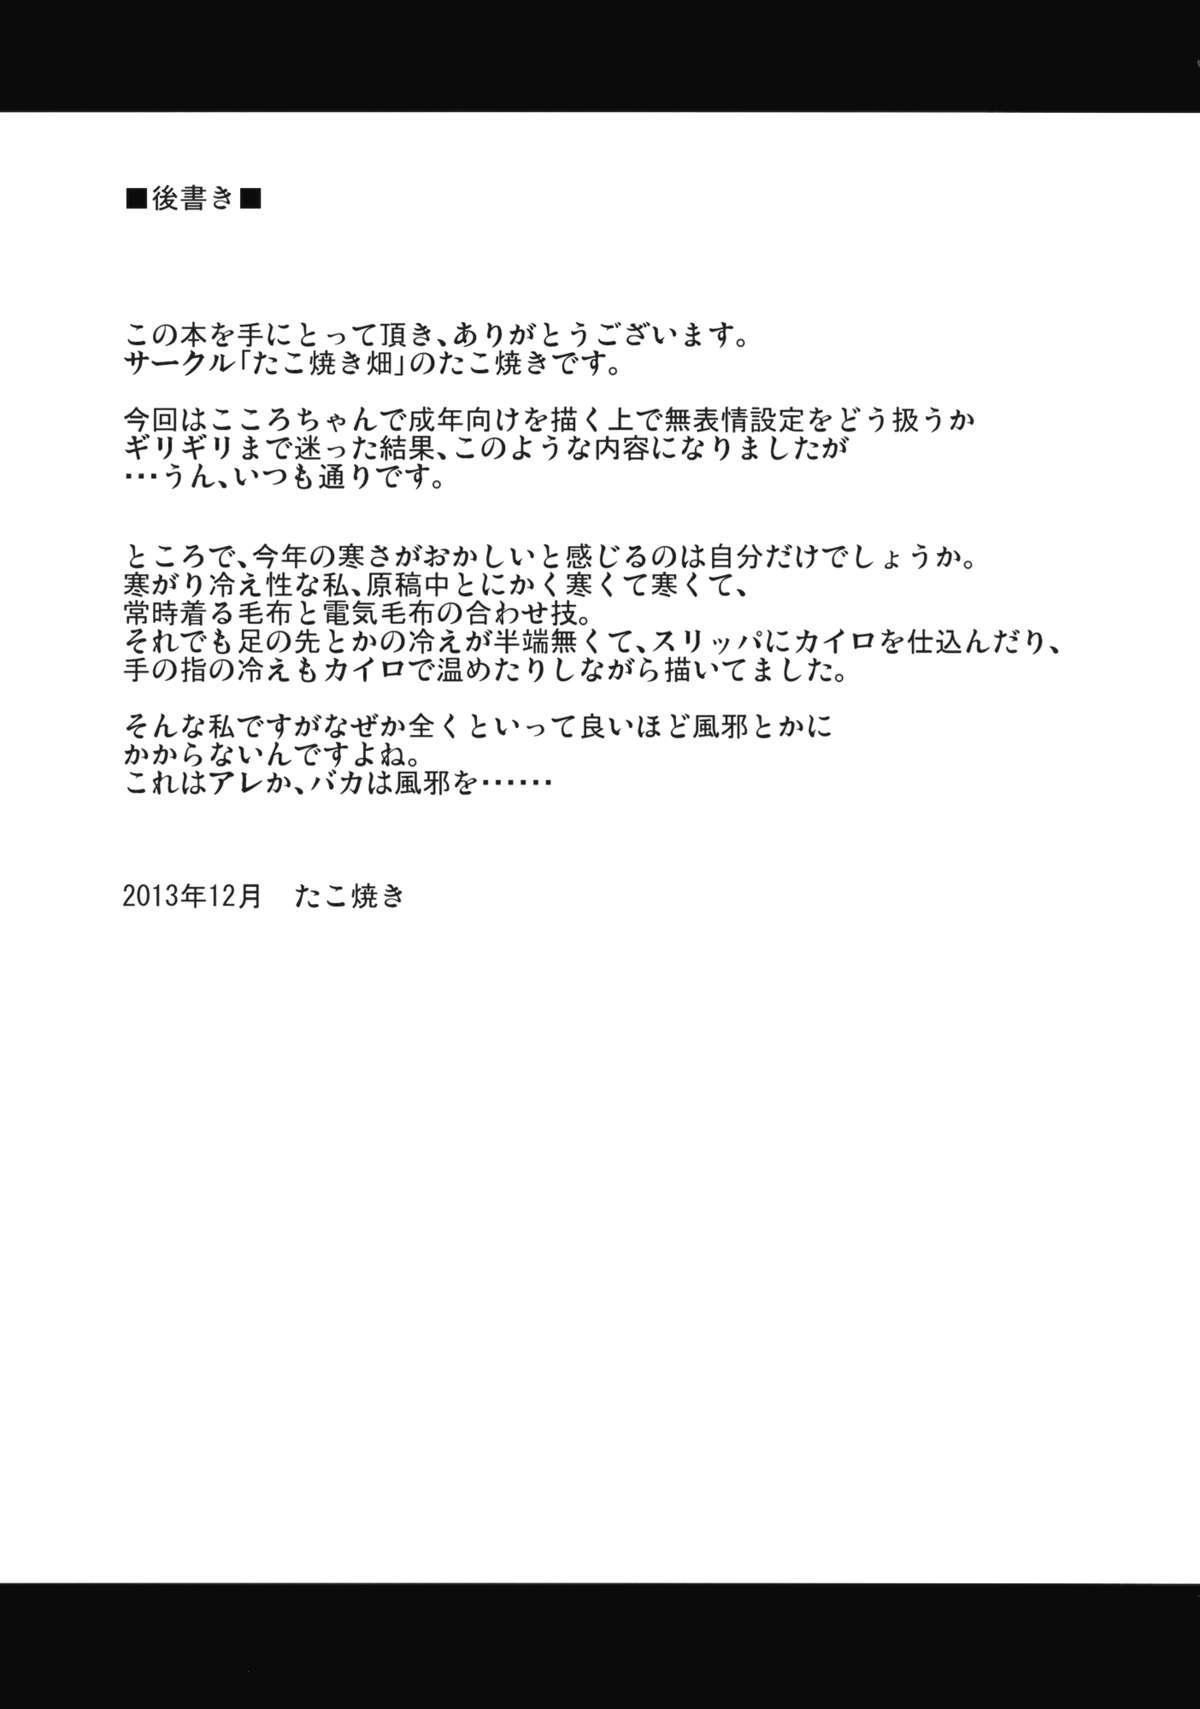 Kokoro, Sarakedashite 23